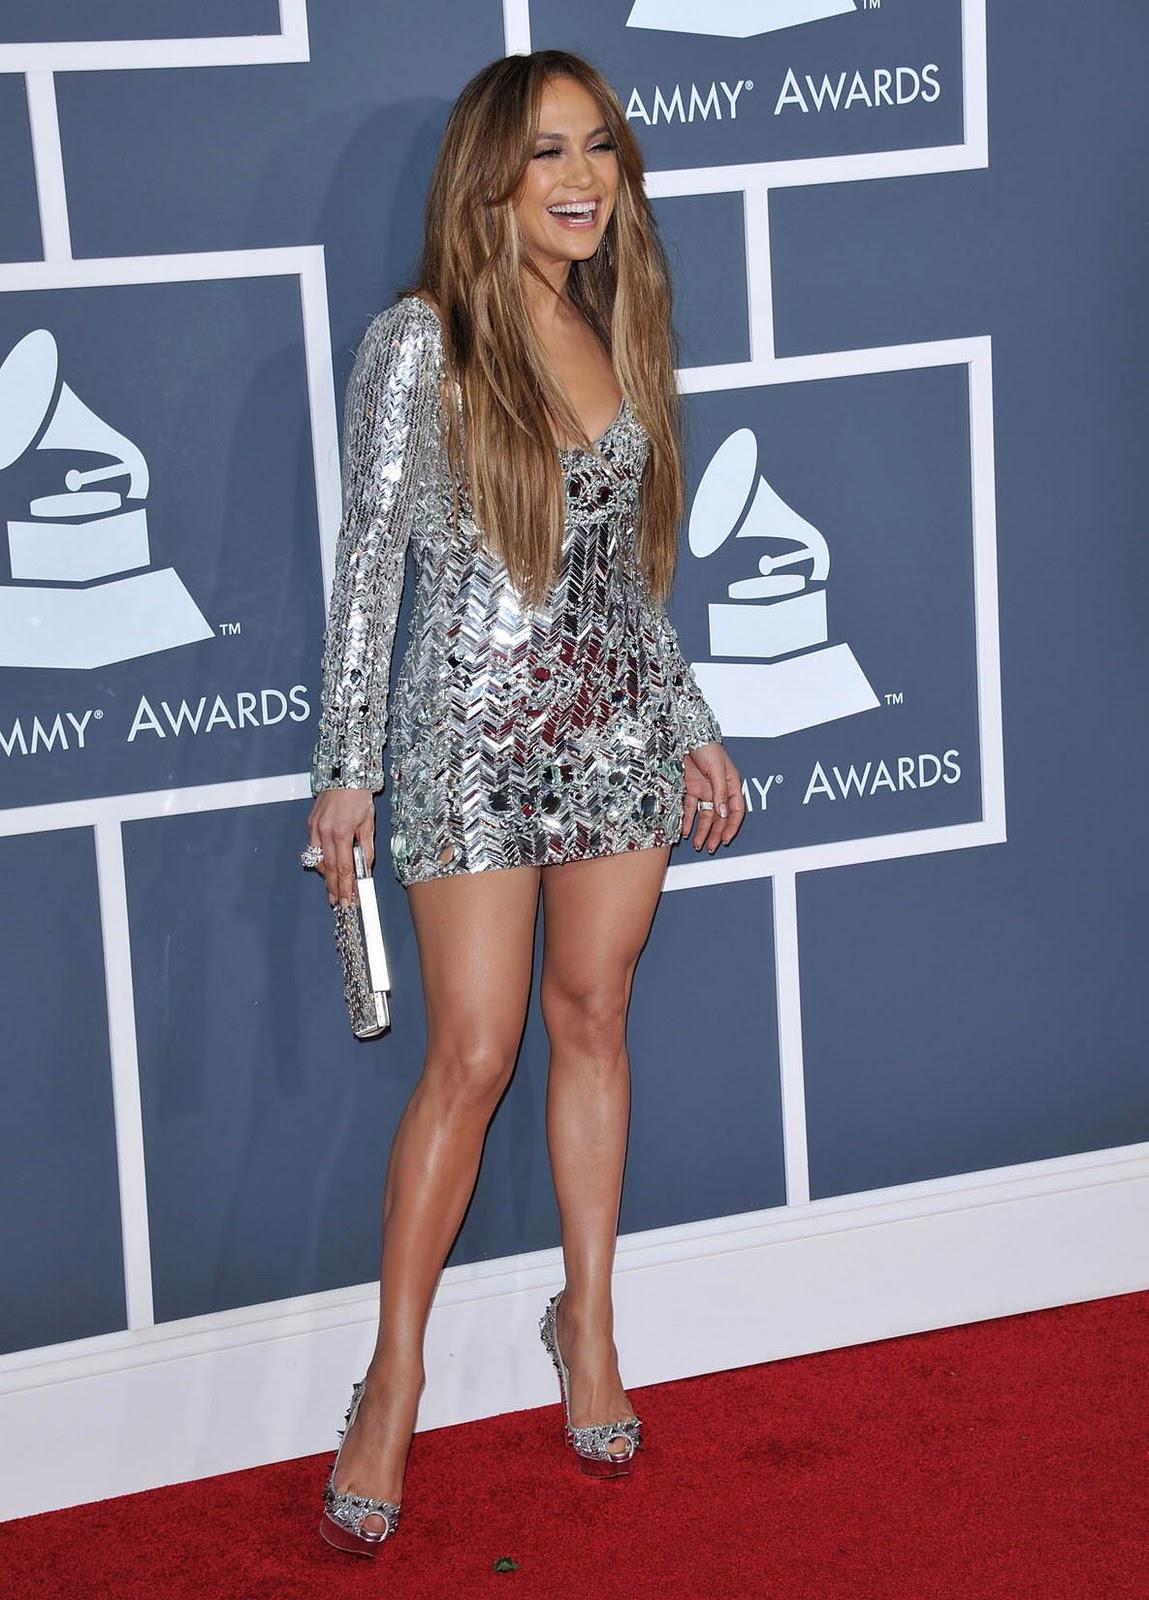 http://1.bp.blogspot.com/-W5g7GuCK3gQ/TuEiveGPqSI/AAAAAAAAAzU/XDeKw_0iV6Y/s1600/jennifer_lopez_grammy_dress_7.jpg